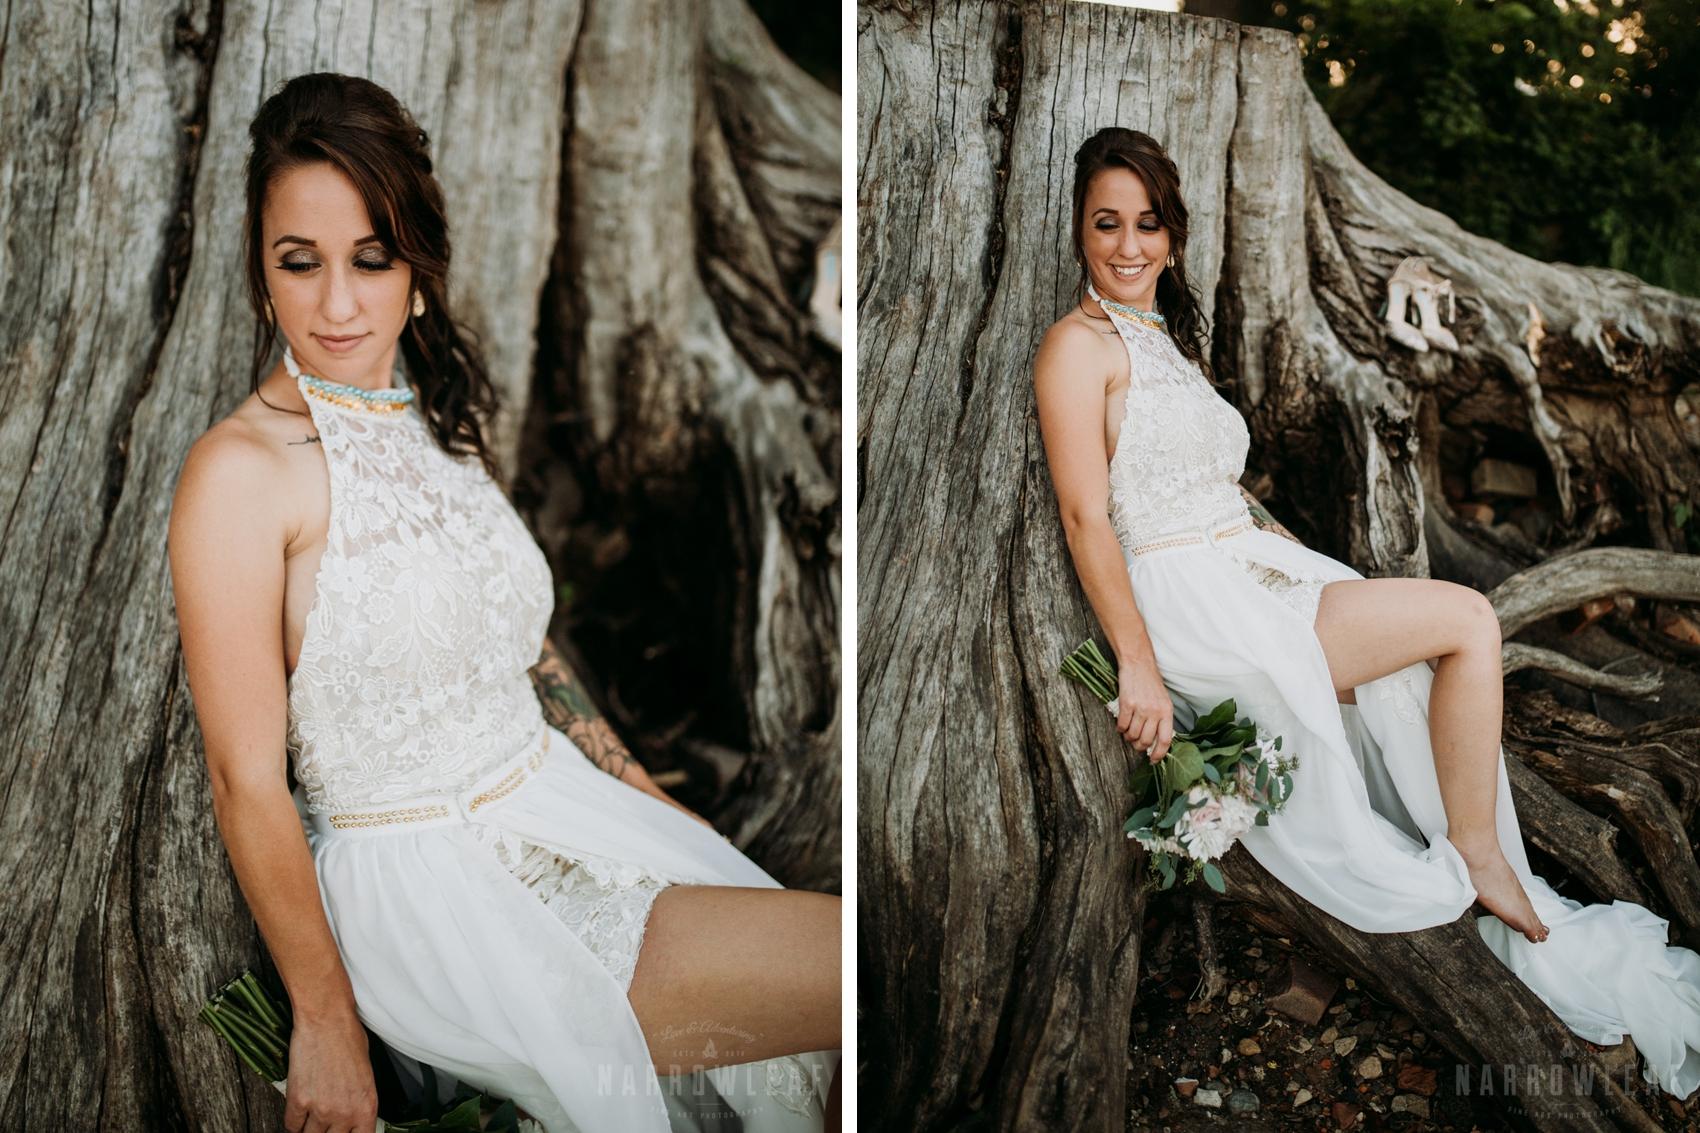 moody-minnesota-outdoor-elopement-bride-narrowLeaf-photography.jpg